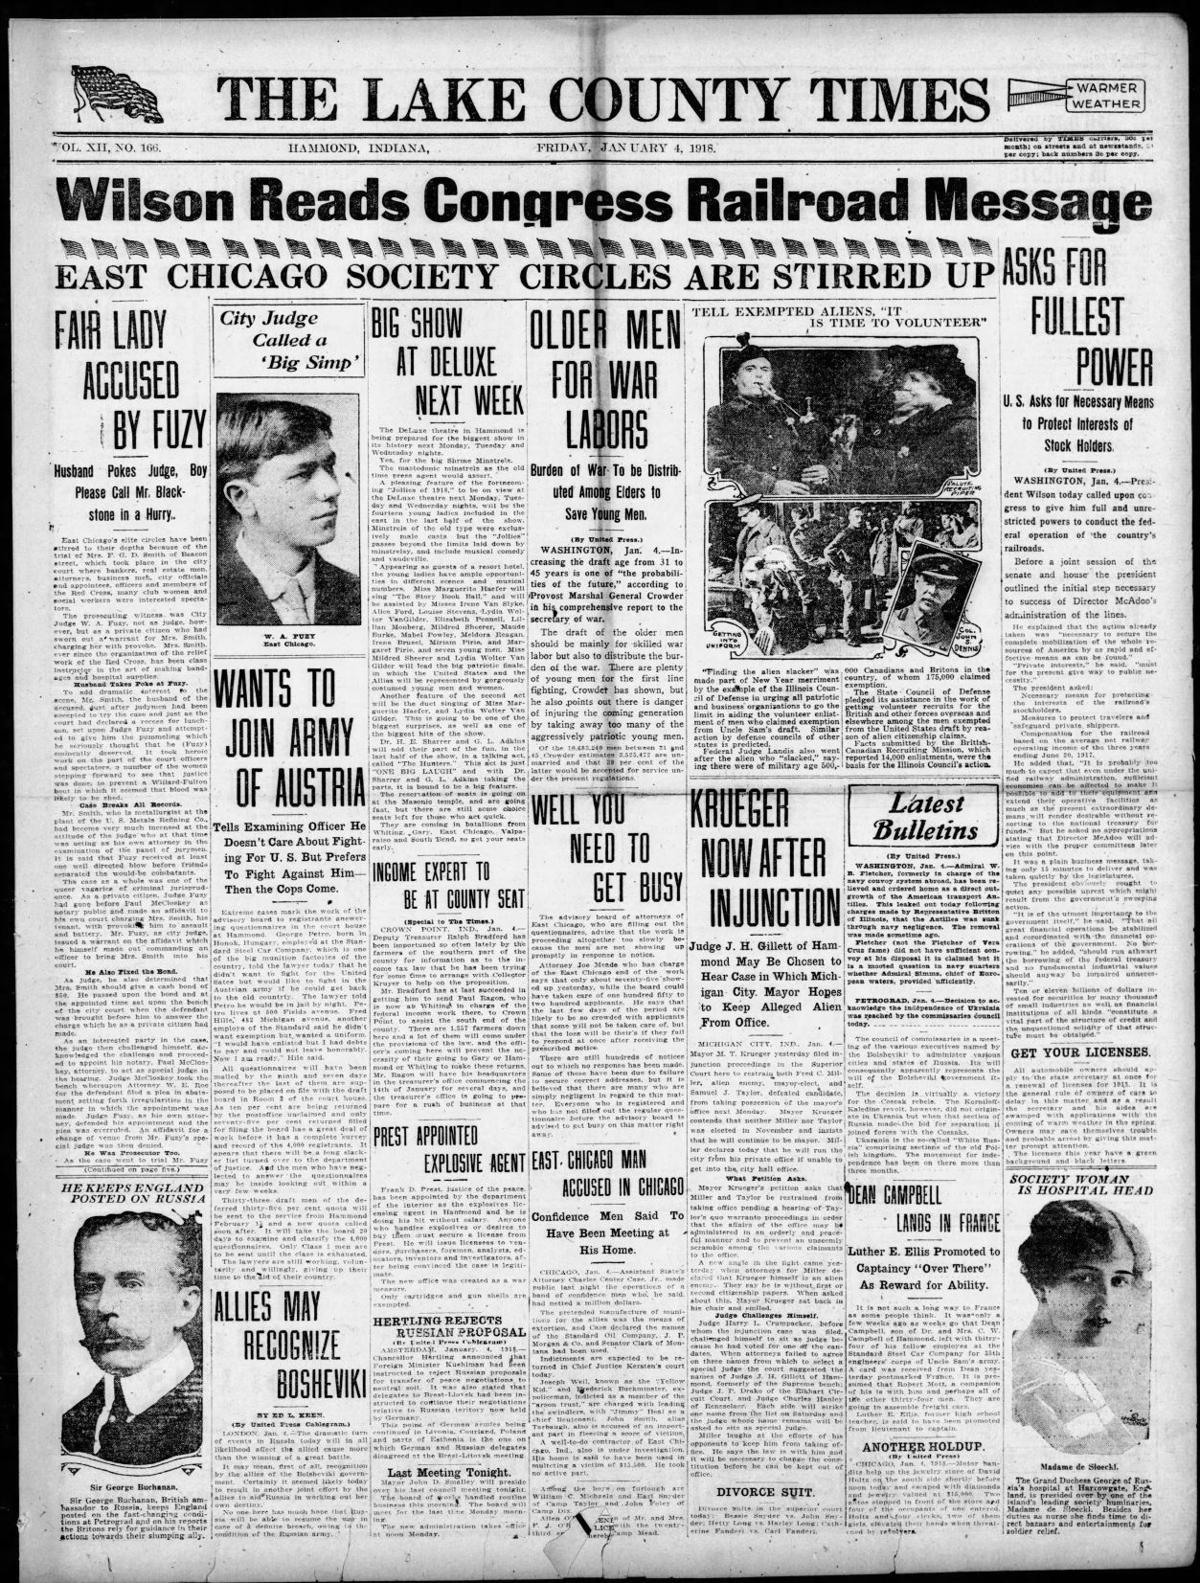 Jan. 4, 1918: Wilson Reads Congress Railroad Message